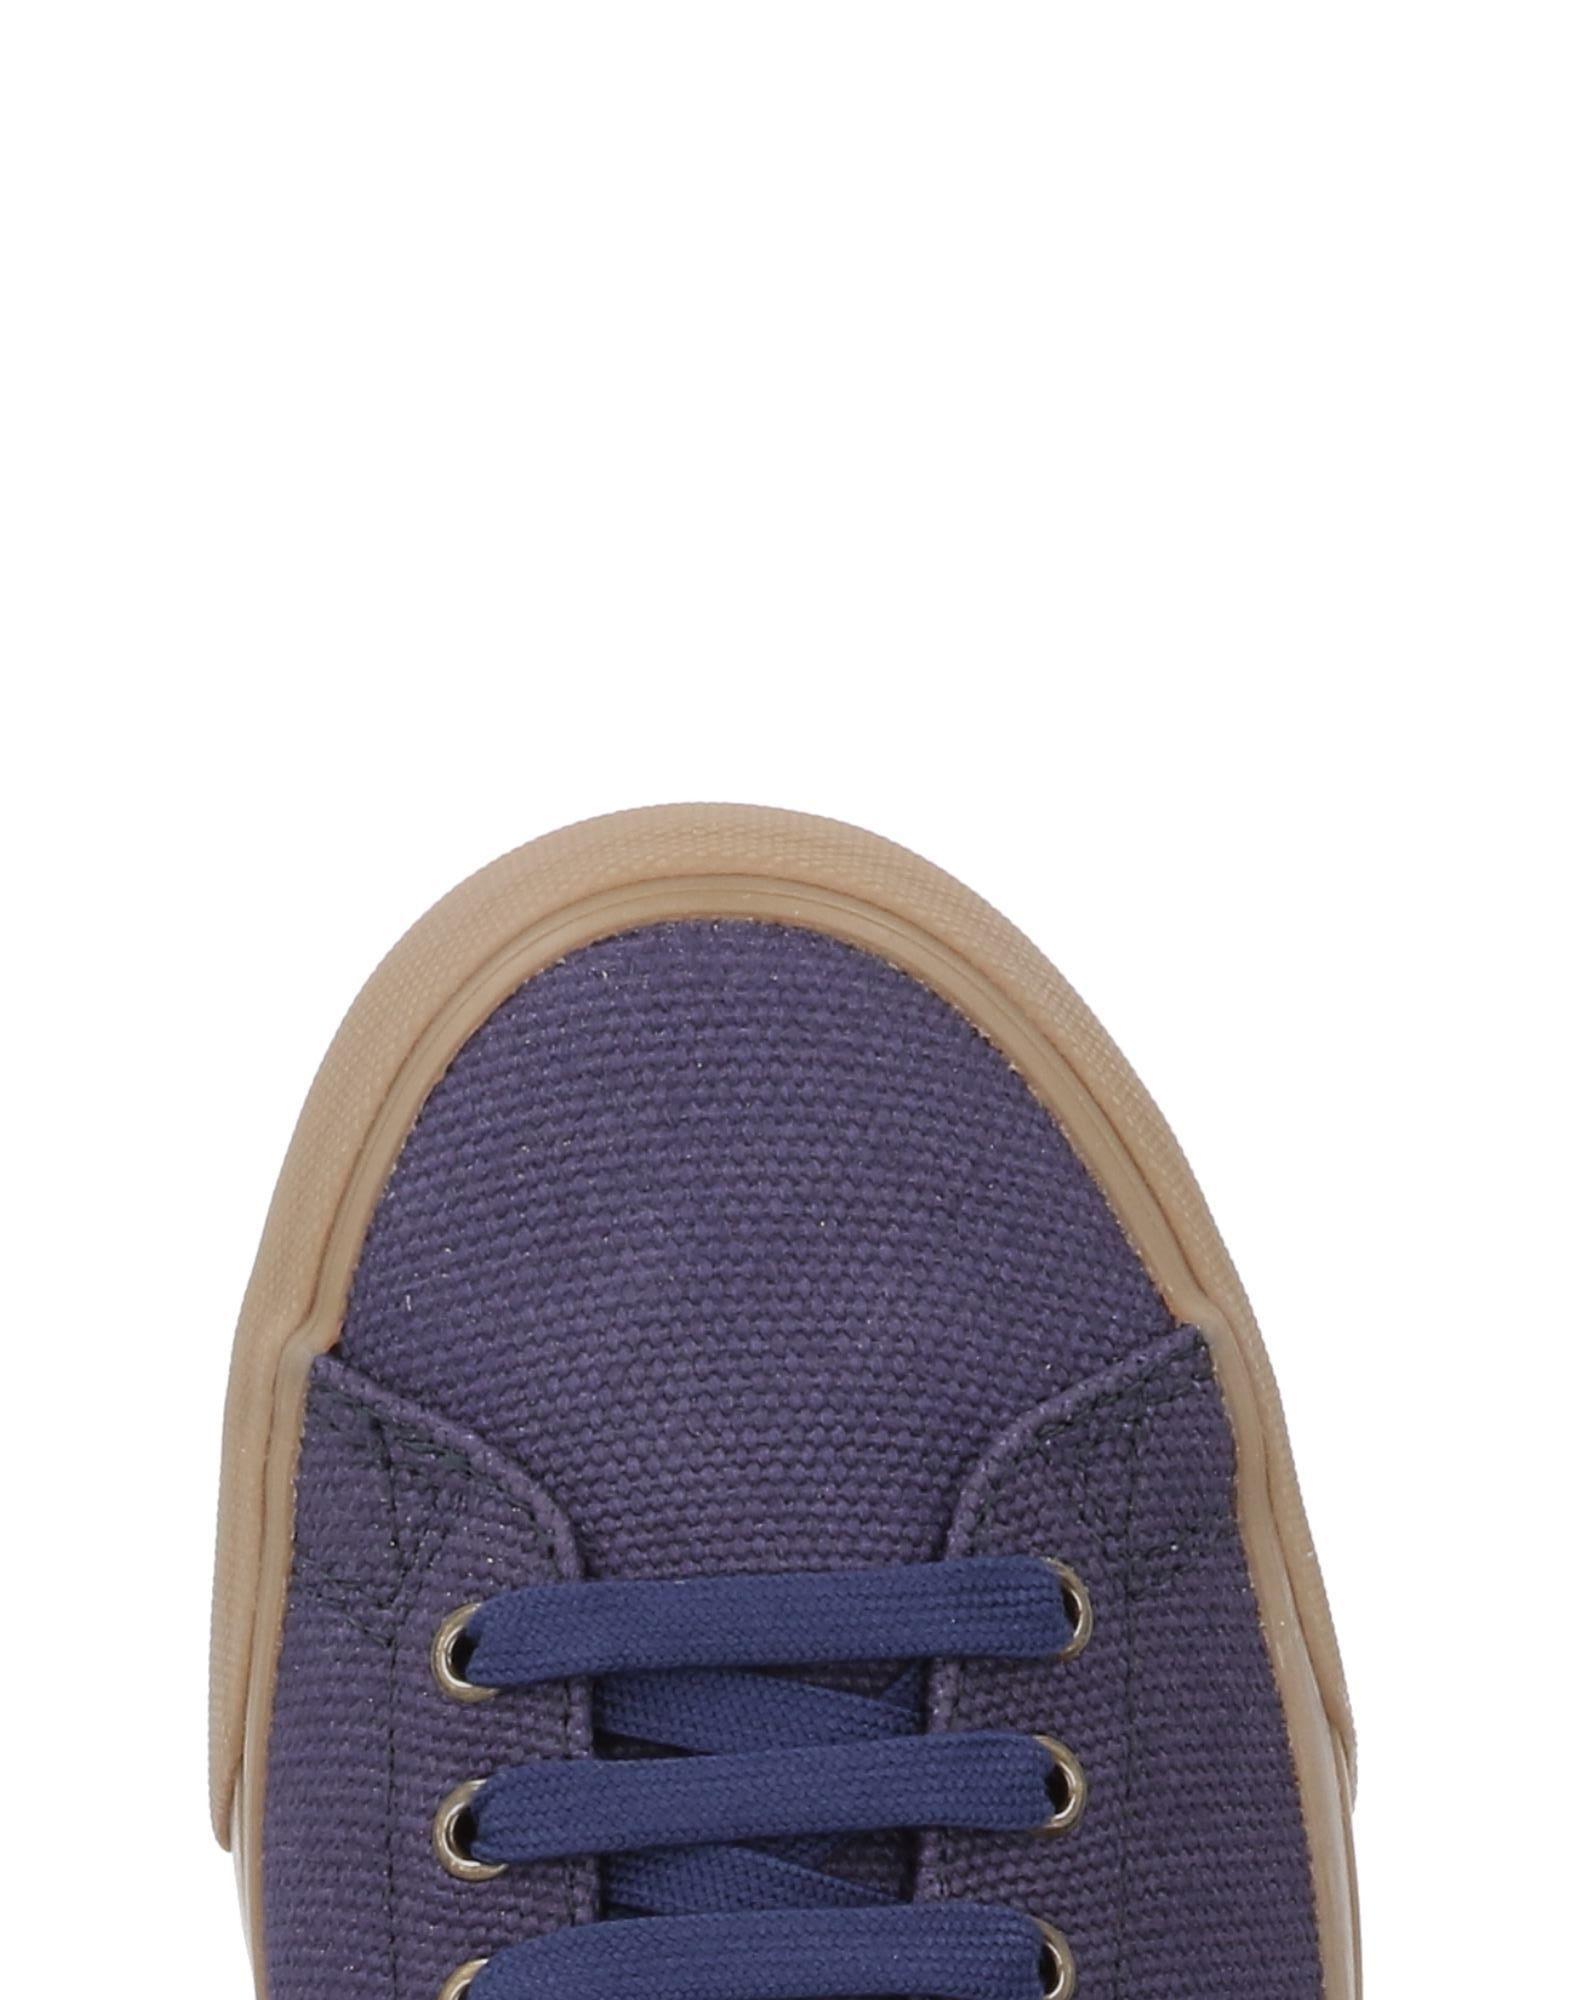 Rabatt echte Sneakers Schuhe Fred Perry Sneakers echte Herren  11495536FM e4f58e